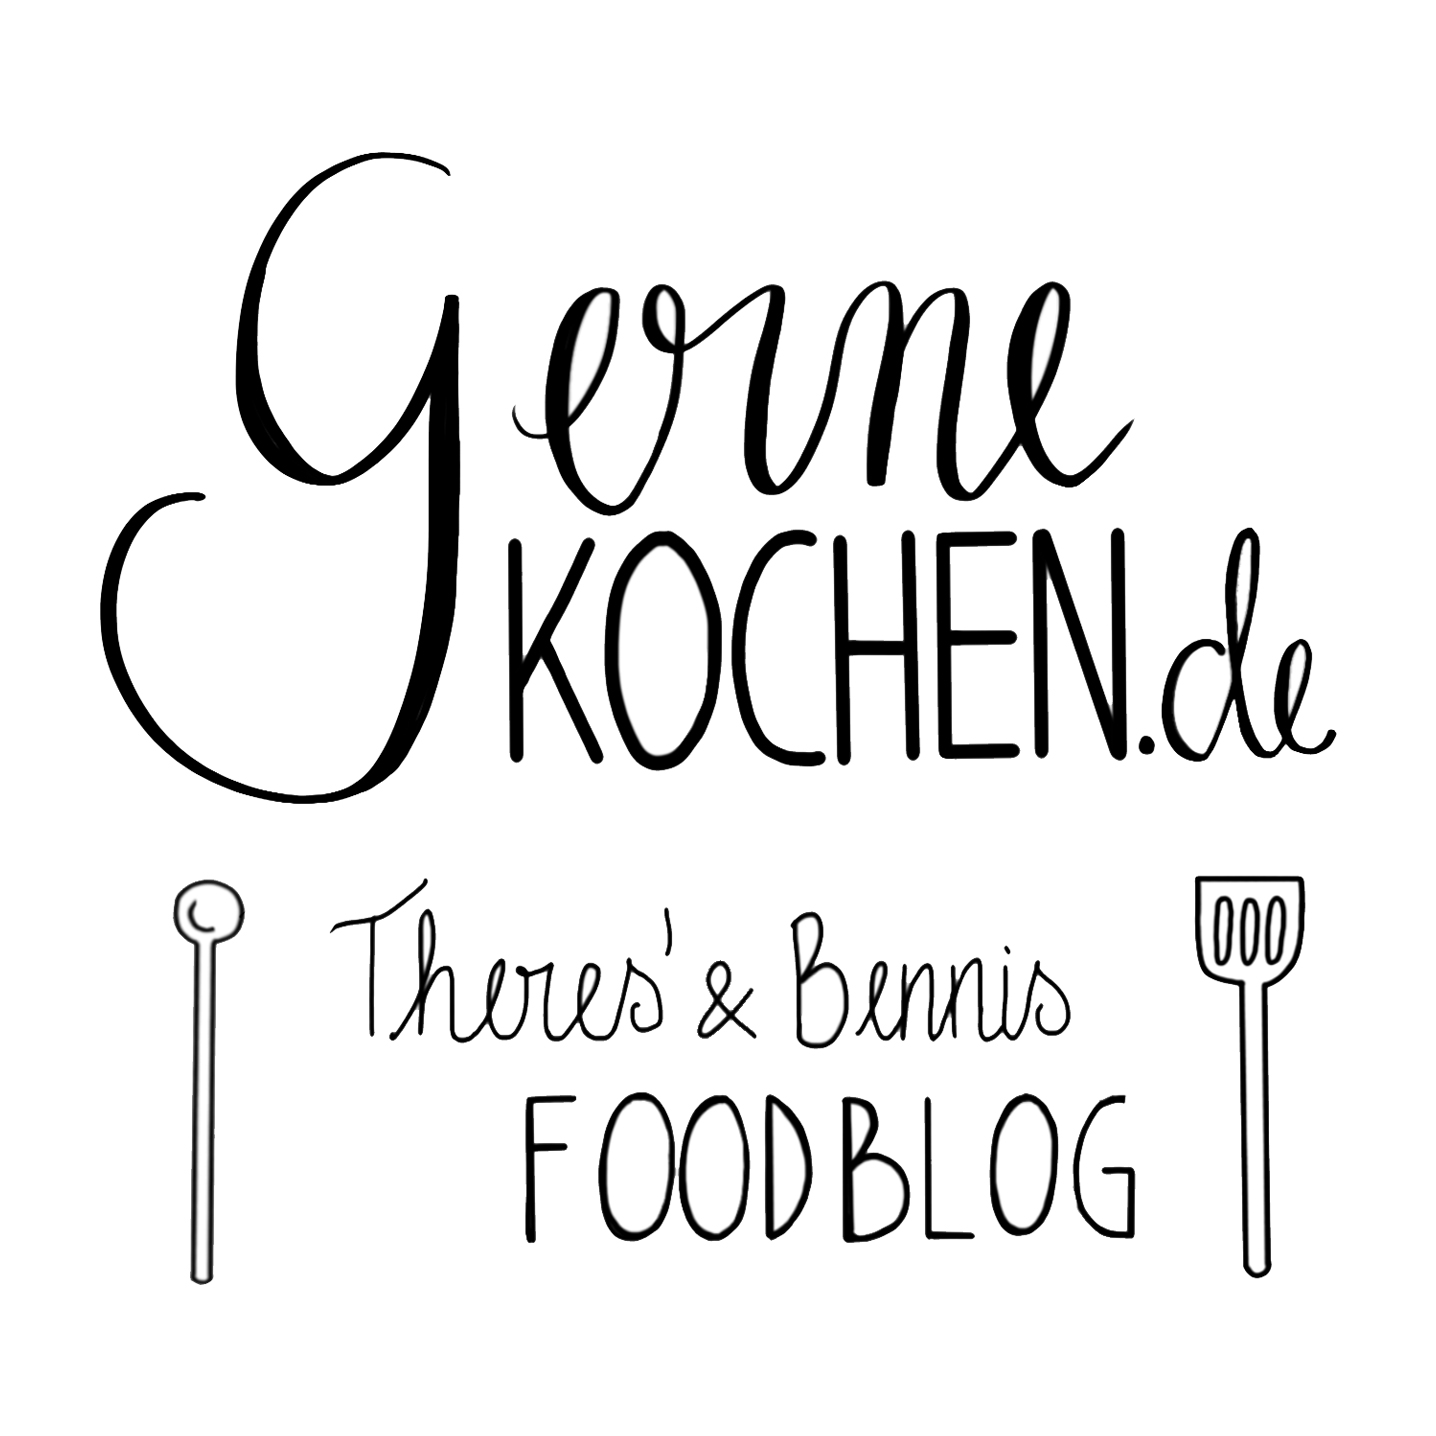 Avatar - Gernekochen.de | Theres & Bennis Foodblog